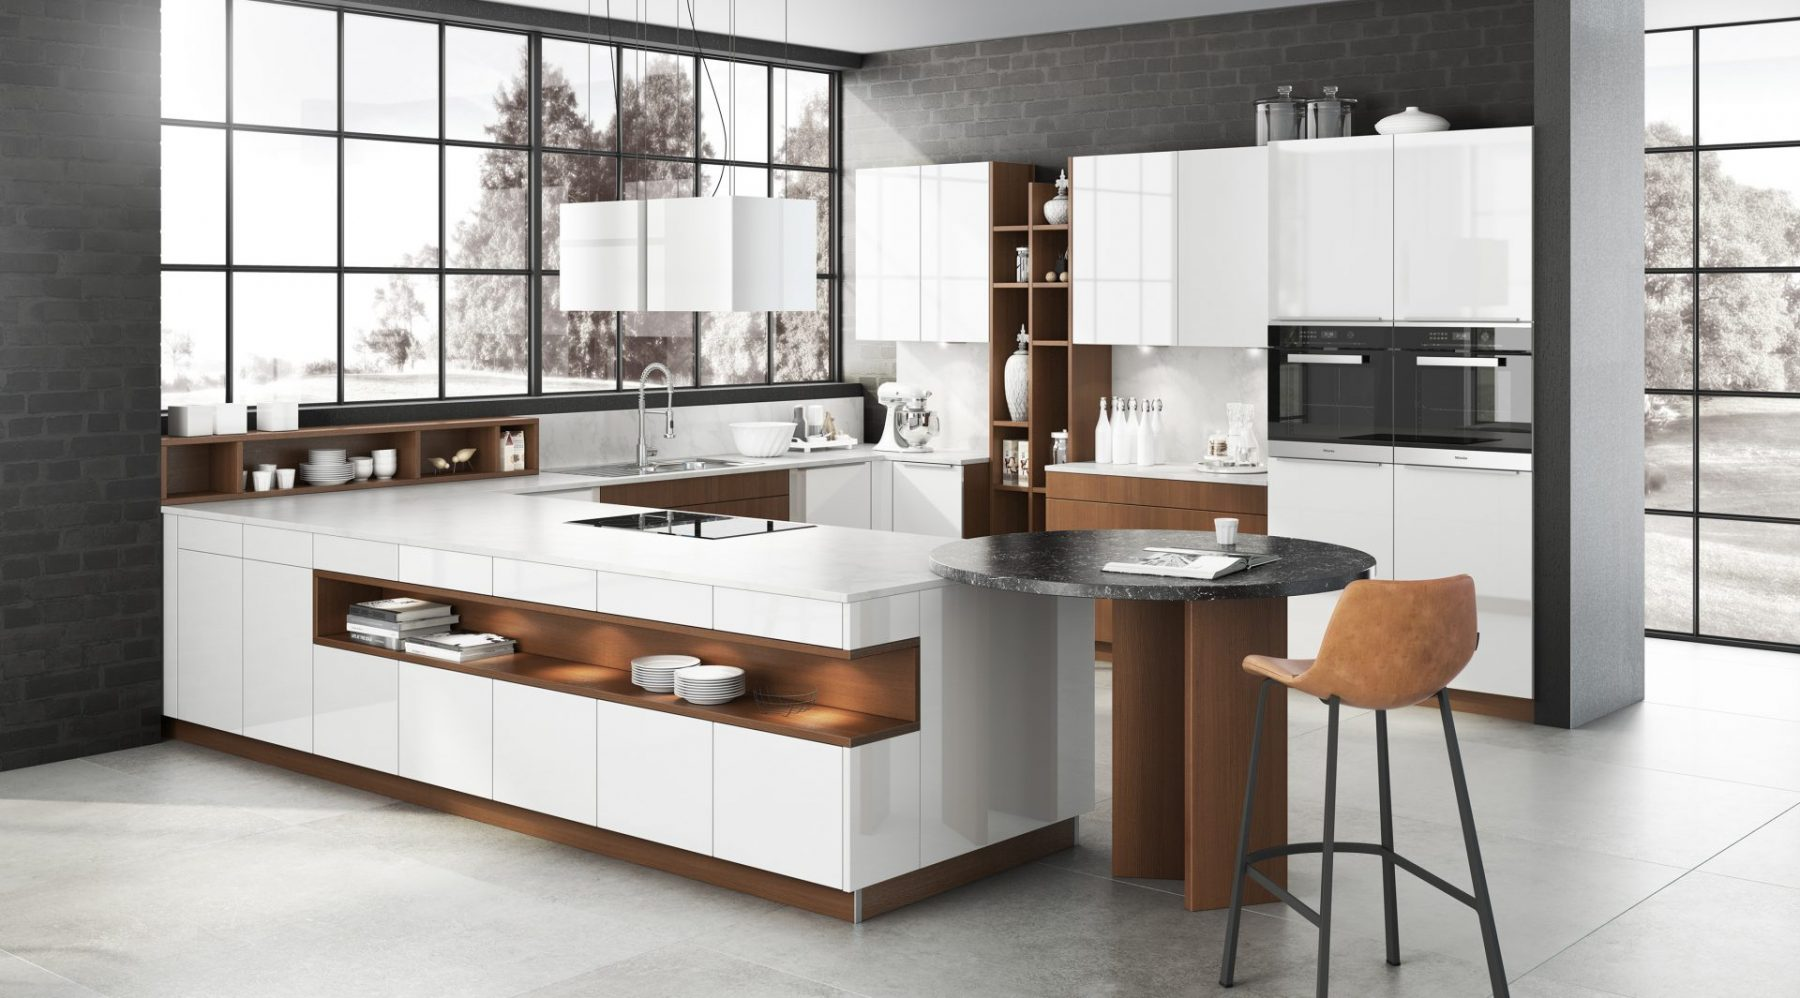 Bauformat-Küche-Weiss